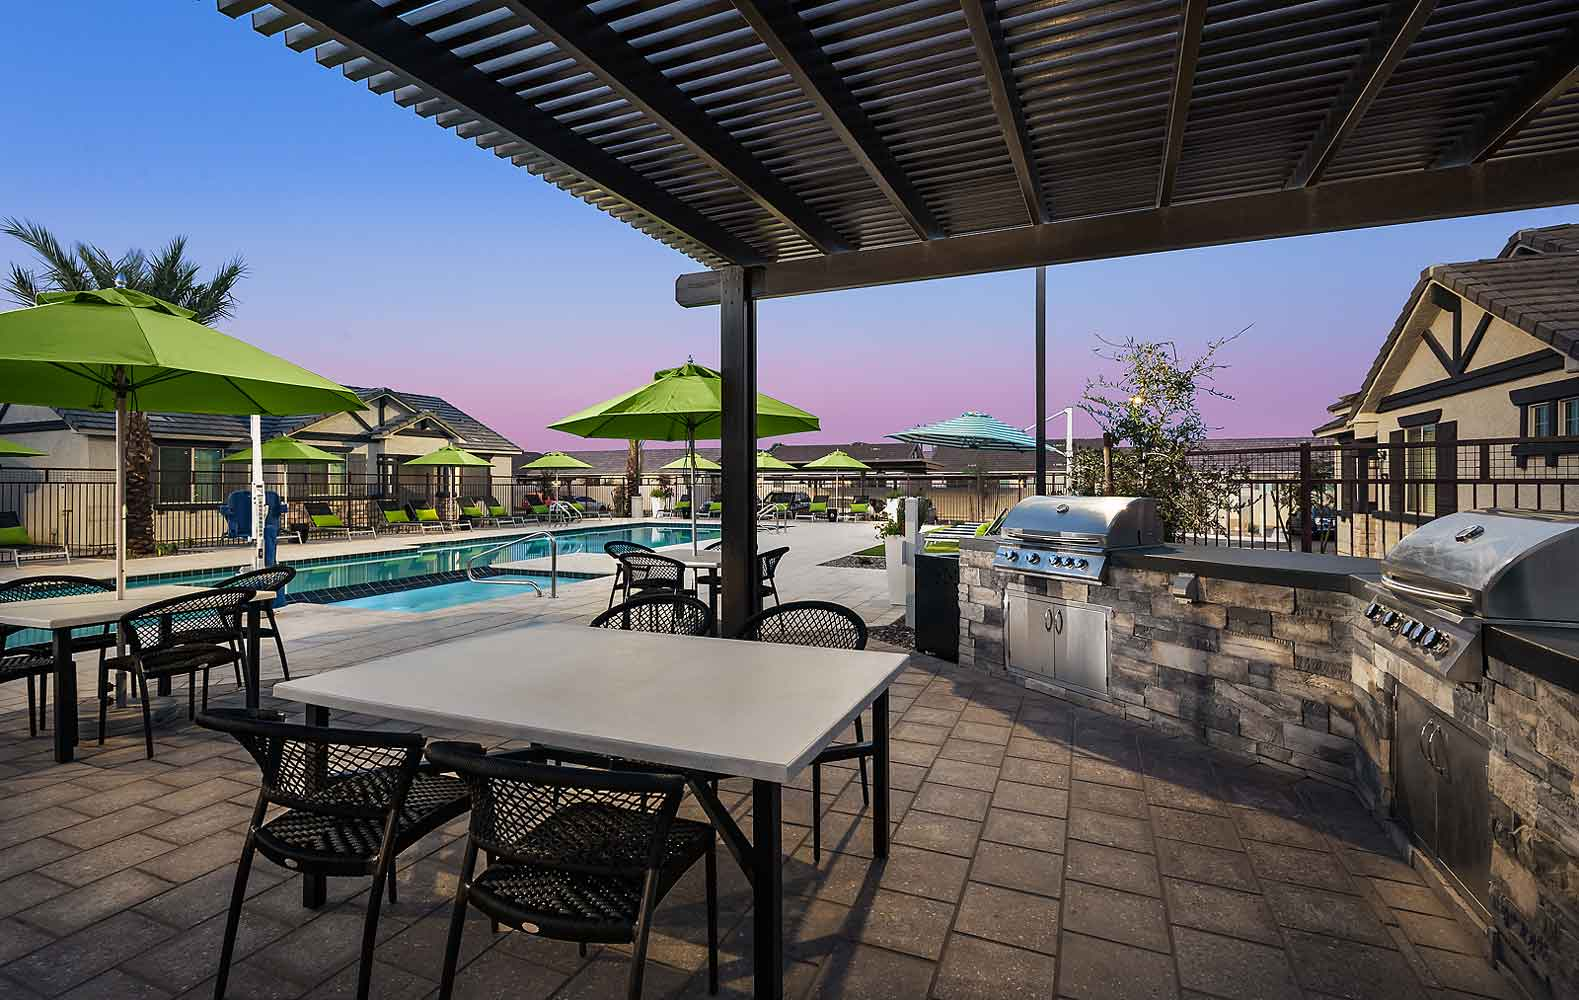 Swimming Pool and BBQ Ramada at Harvard Crossing Apartments in Goodyear, AZ